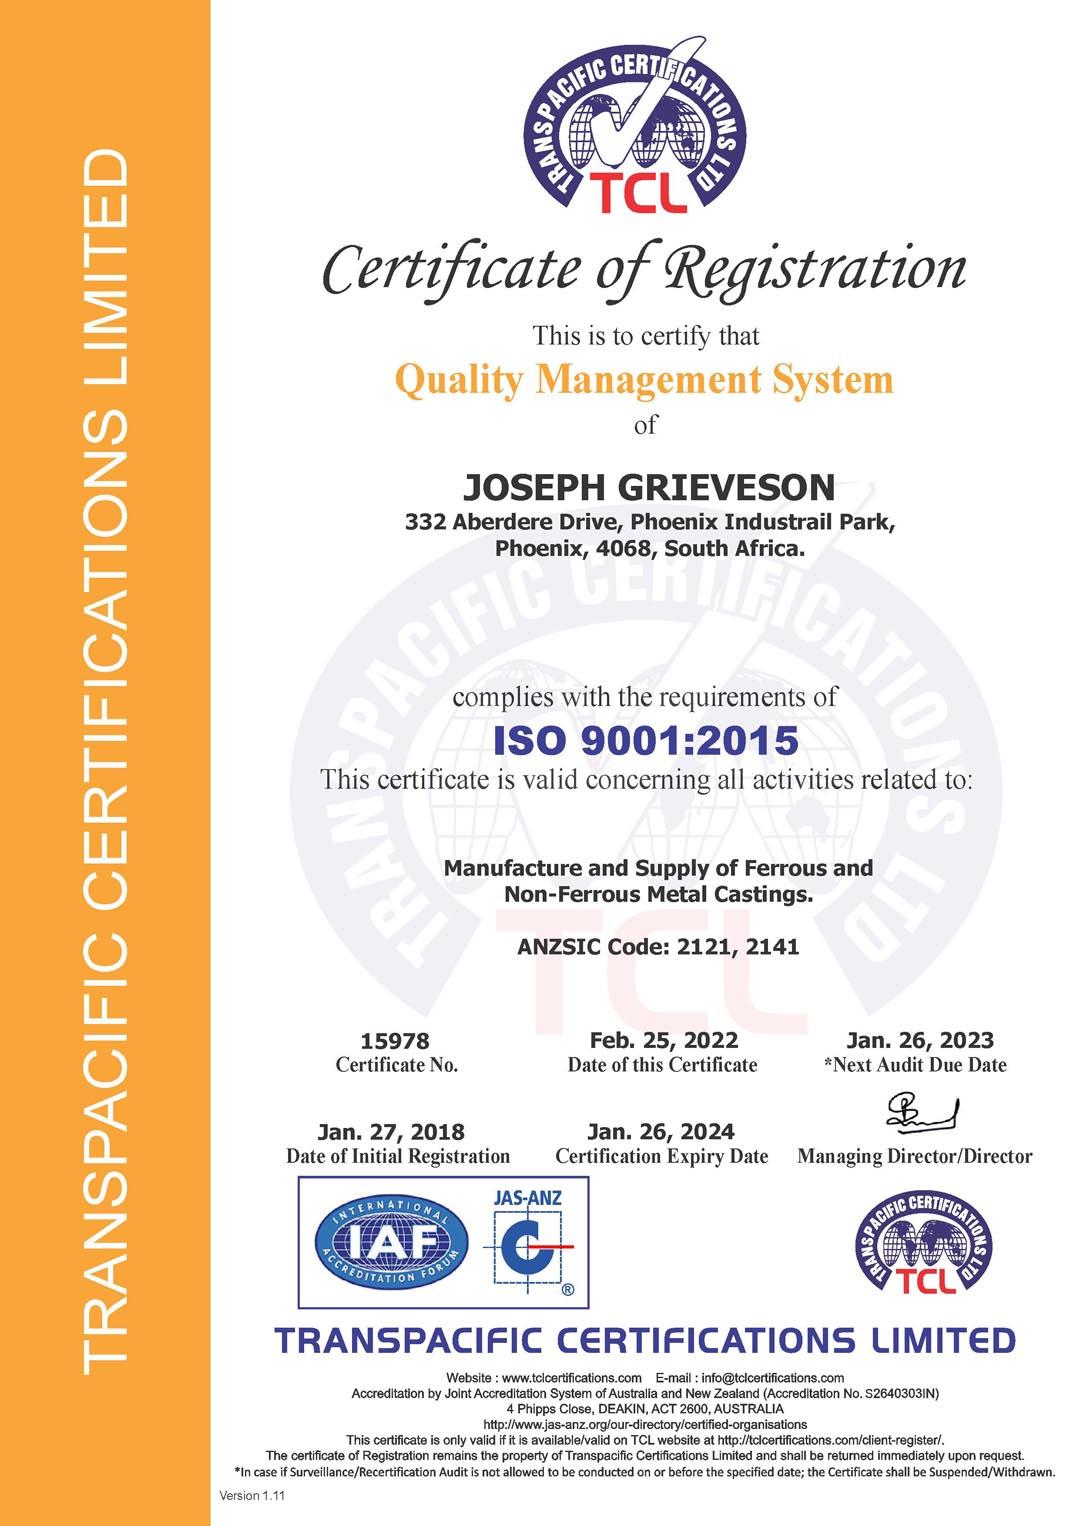 Joseph Grieveson ISO 9001 2015 Certificate